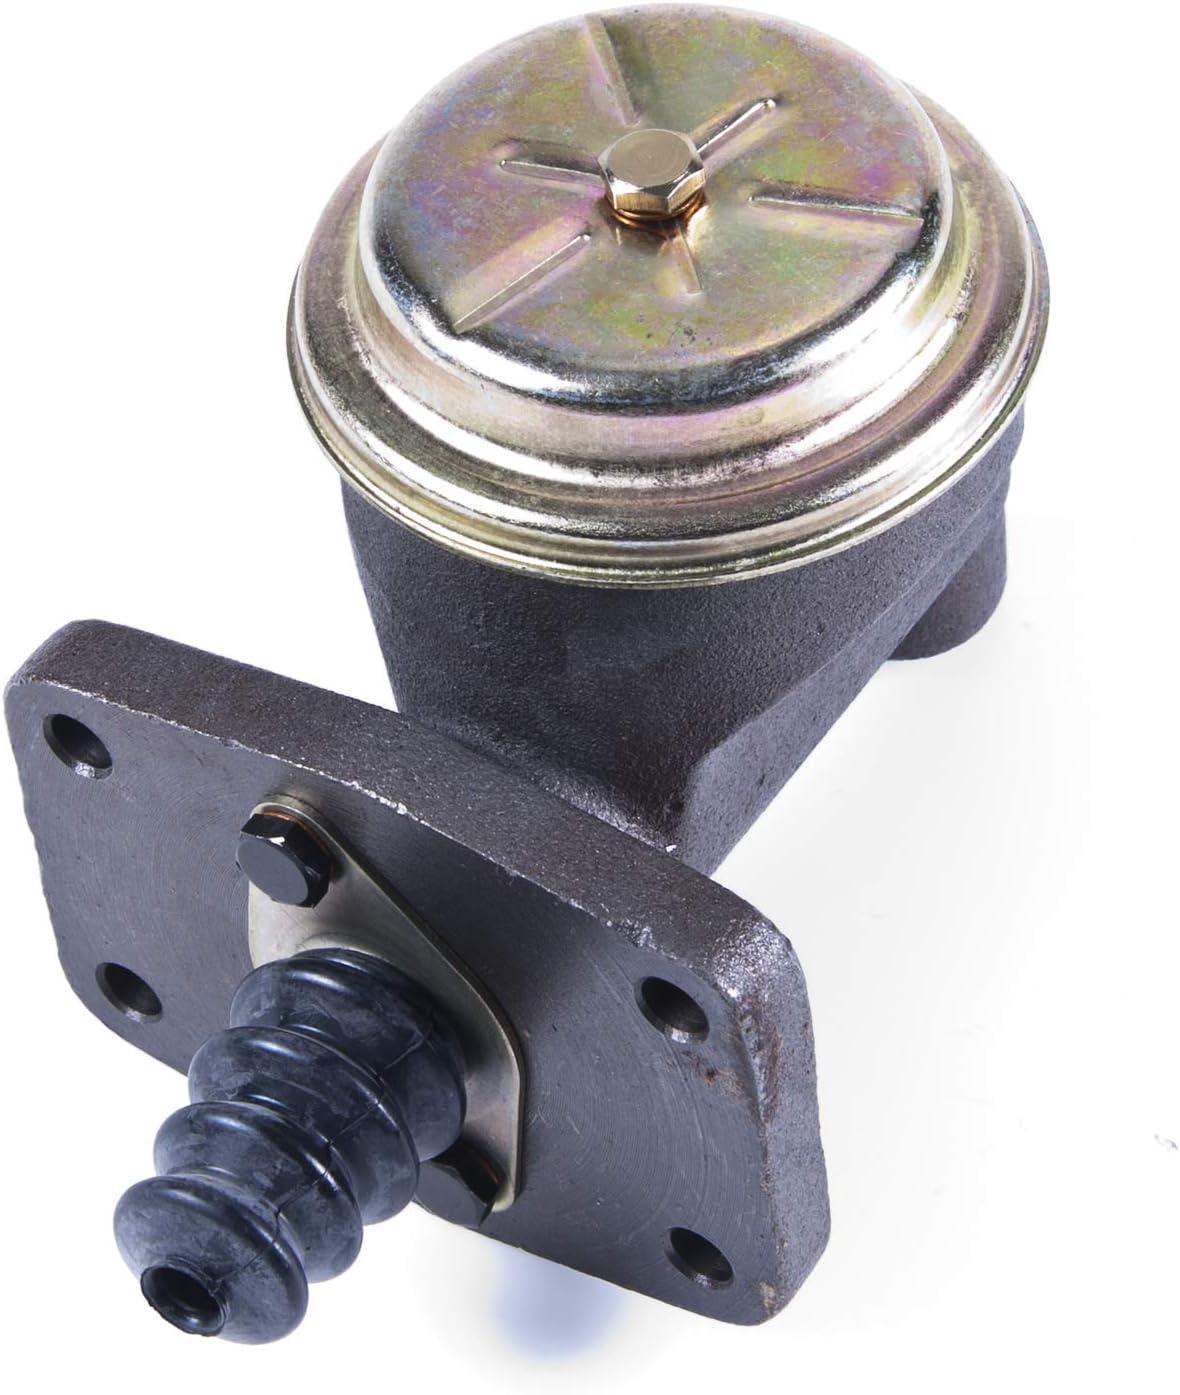 Schaeffler LuK unisex LMC513 Clutch Release Master Fashion Cylinder OEM